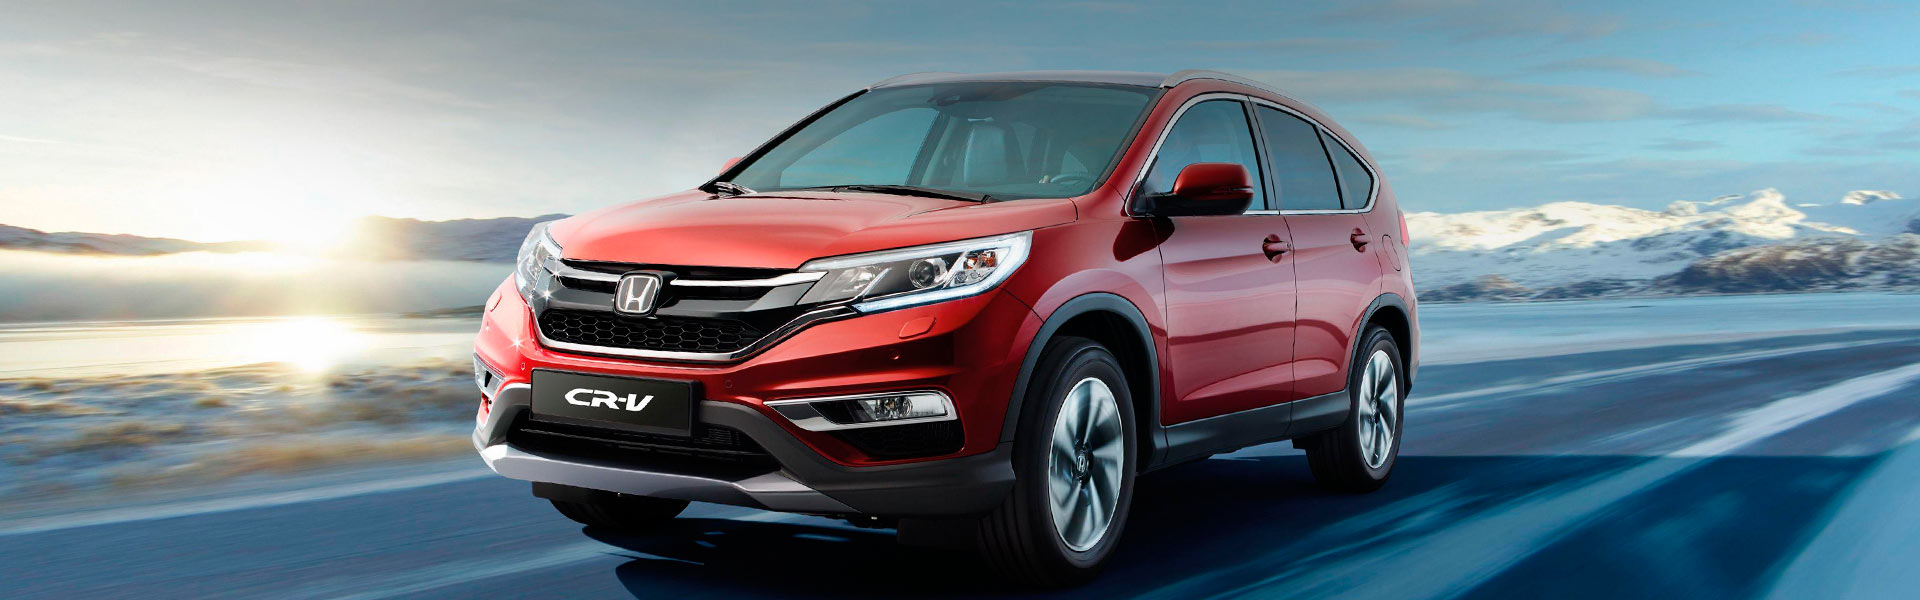 Подушка двигателя на Honda CR-V